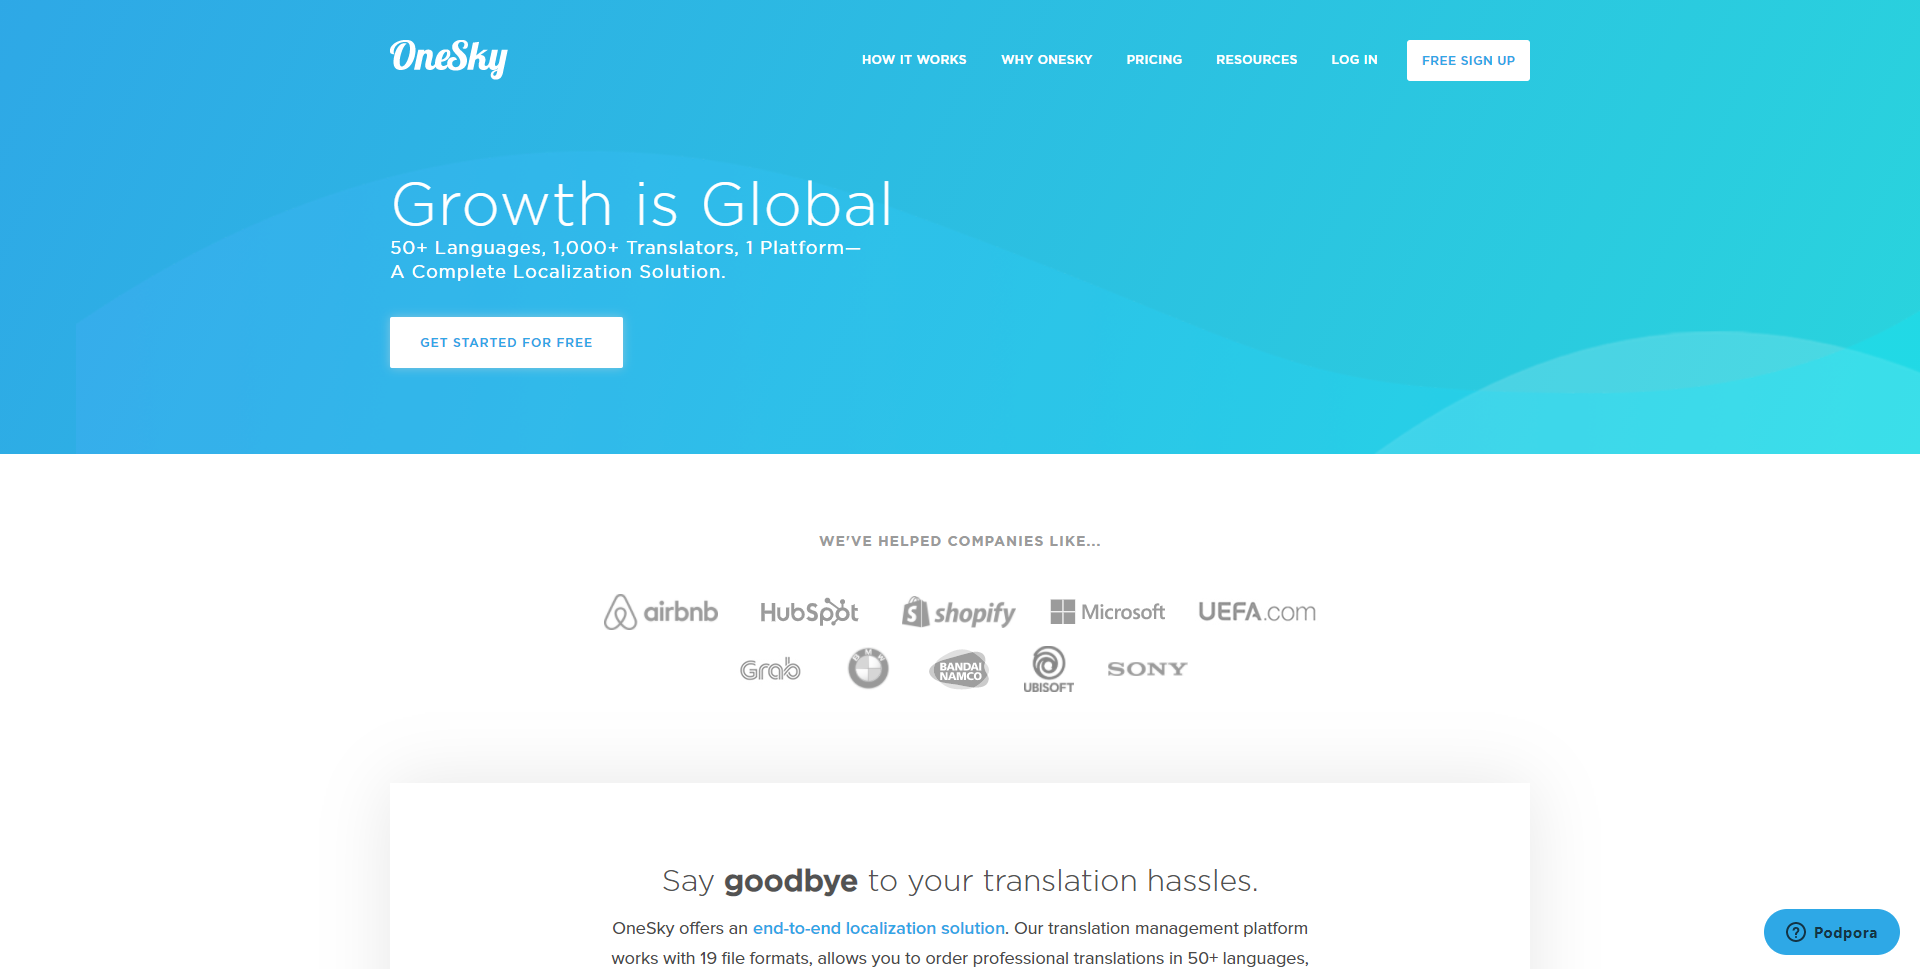 OneSkyApp.com Homepage